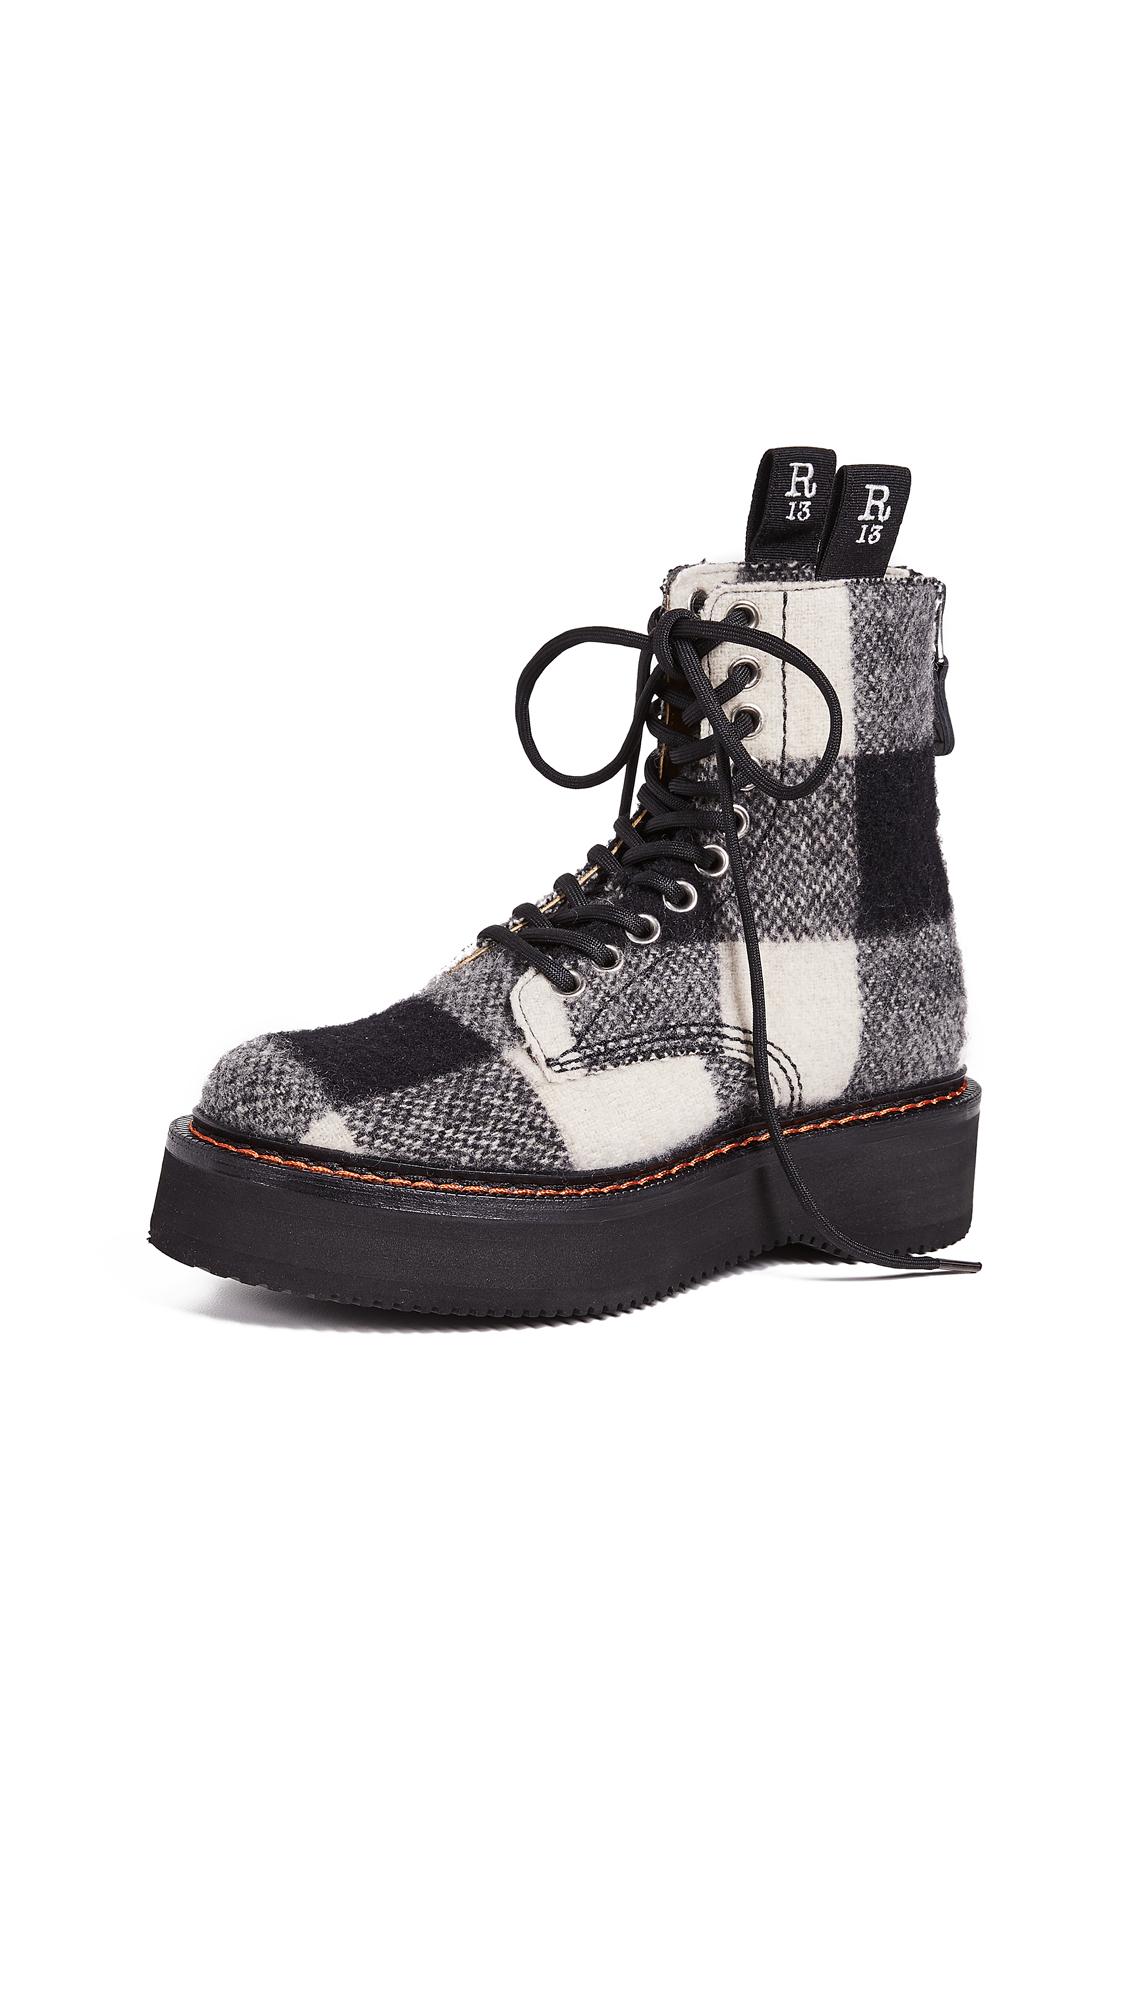 R13 Single Stack Boots - Black/White Plaid